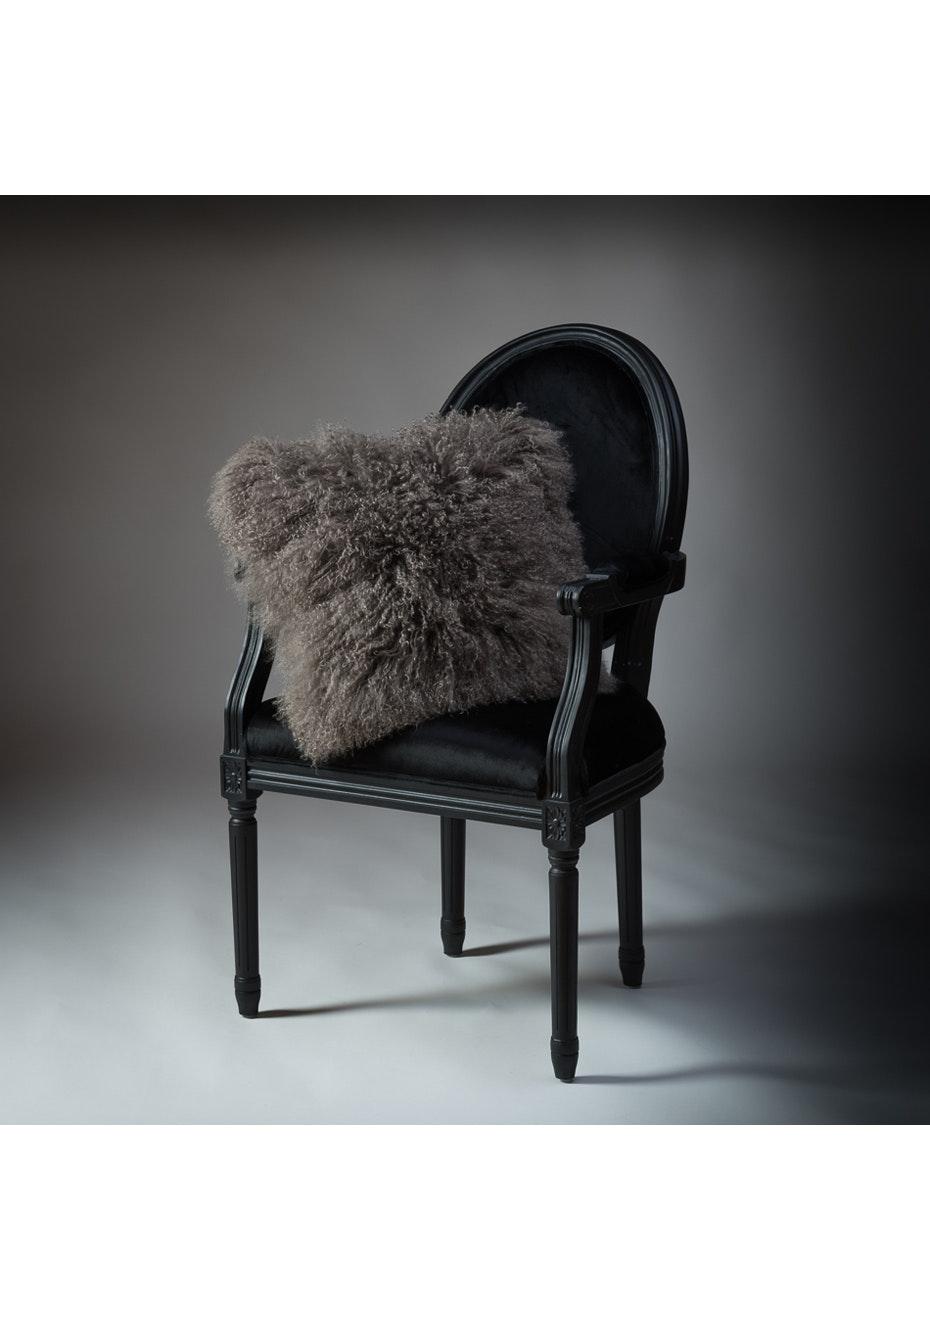 Noozi - Lambs Wool Cushion - Taupe  Grey - Square